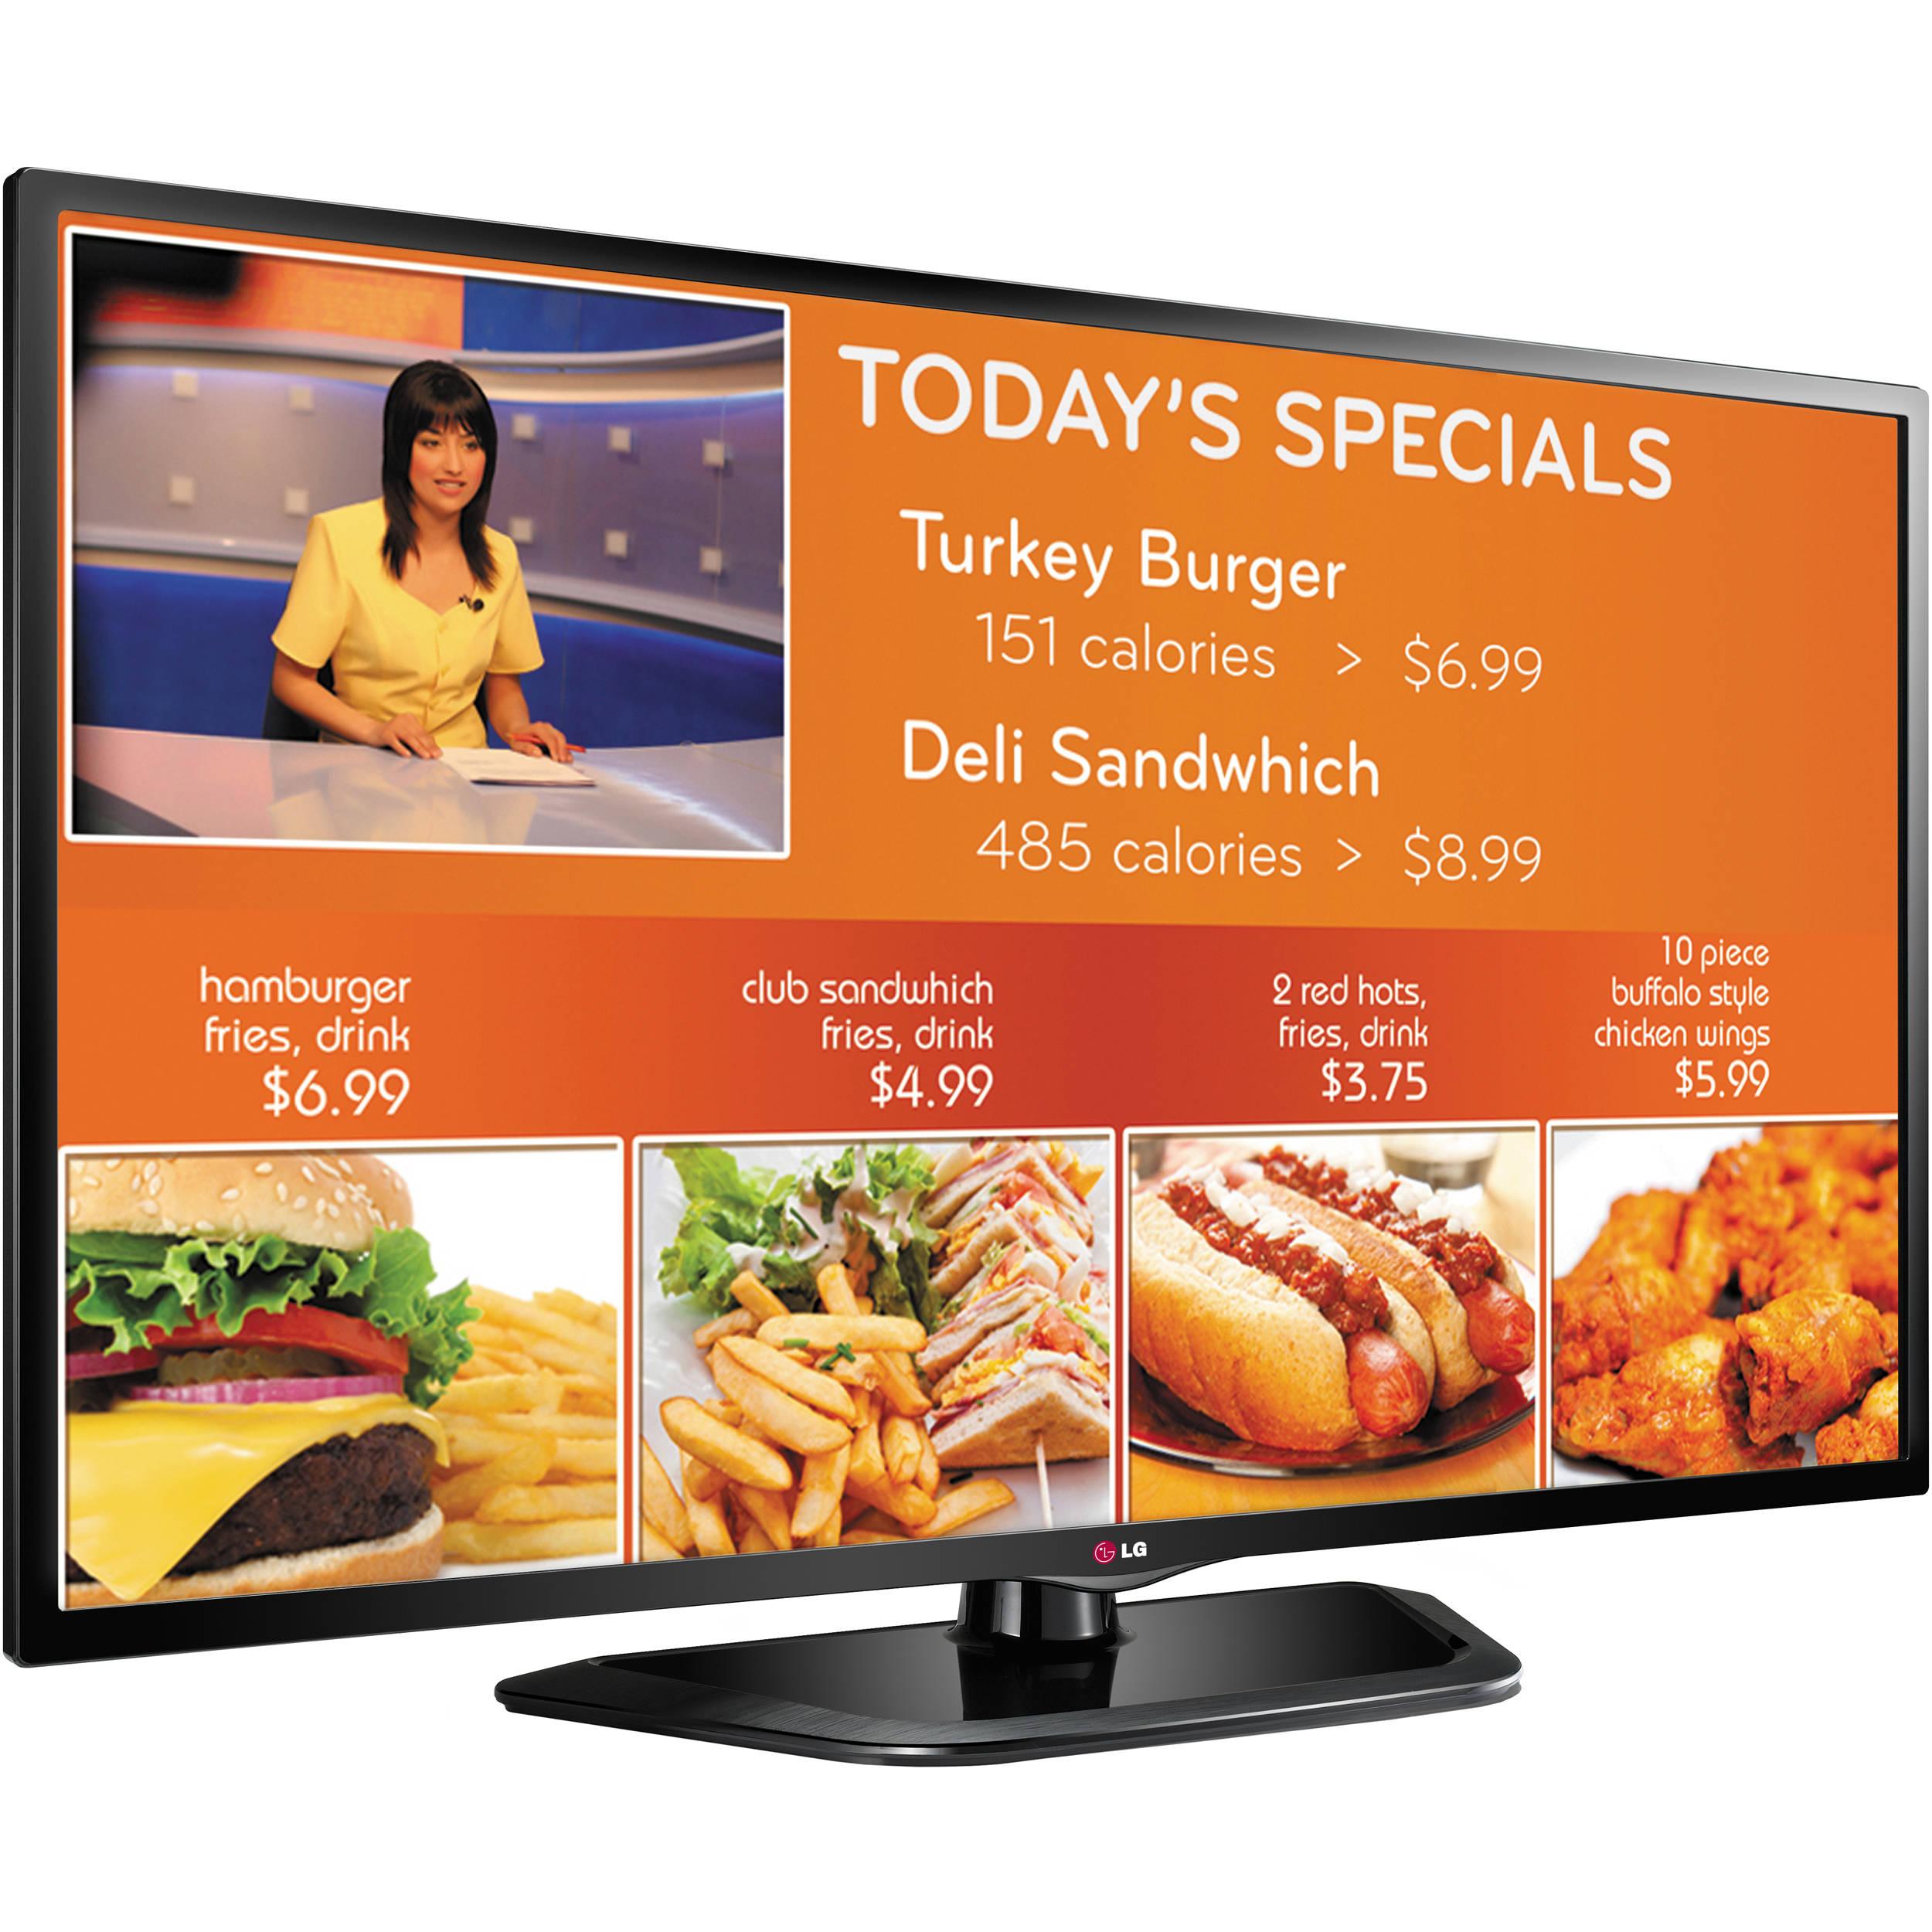 Lg 32 Ezsign Tv For Digital Signage 32ln549e Bh Photo Electronic Door Lock Circuit Led Board Cinema Advertising Buy